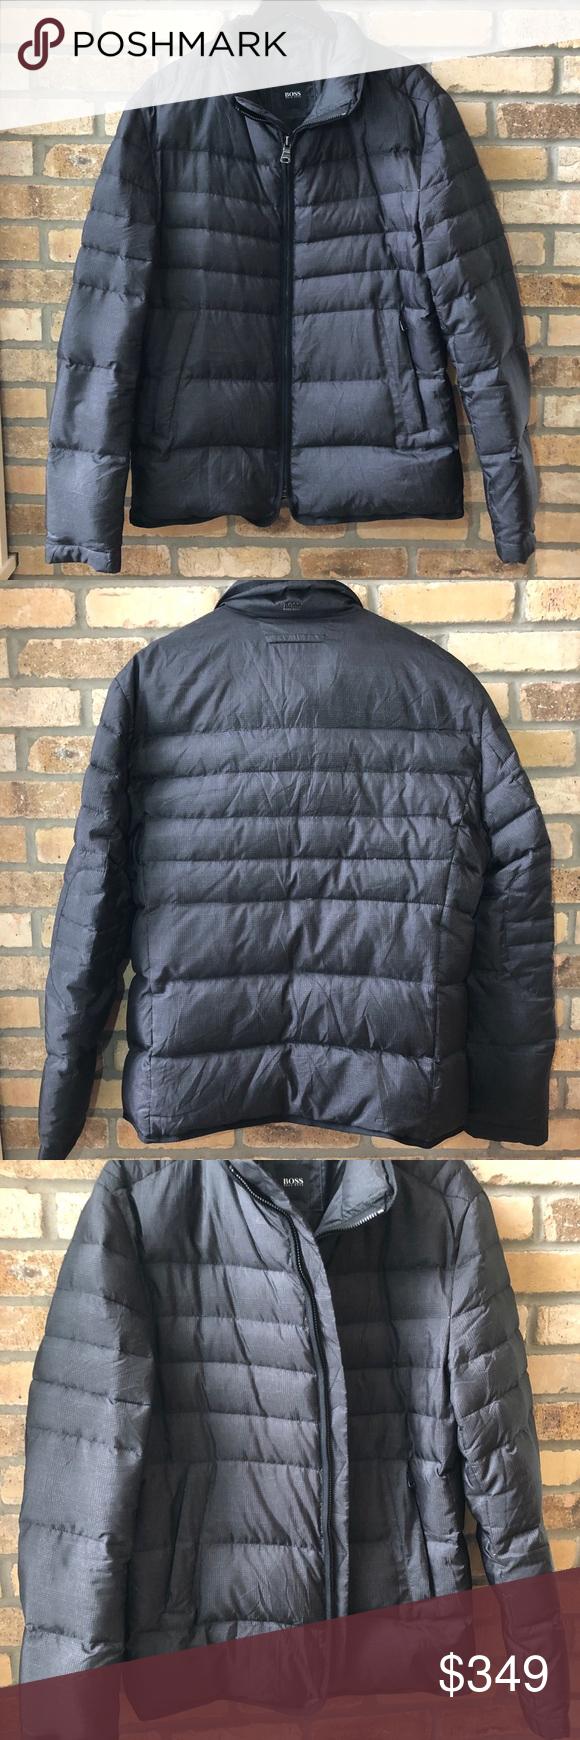 Hugo Boss Down Puffer Men S Jacket Coat Darmir Jackets Clothes Design Coats Jackets [ 1740 x 580 Pixel ]